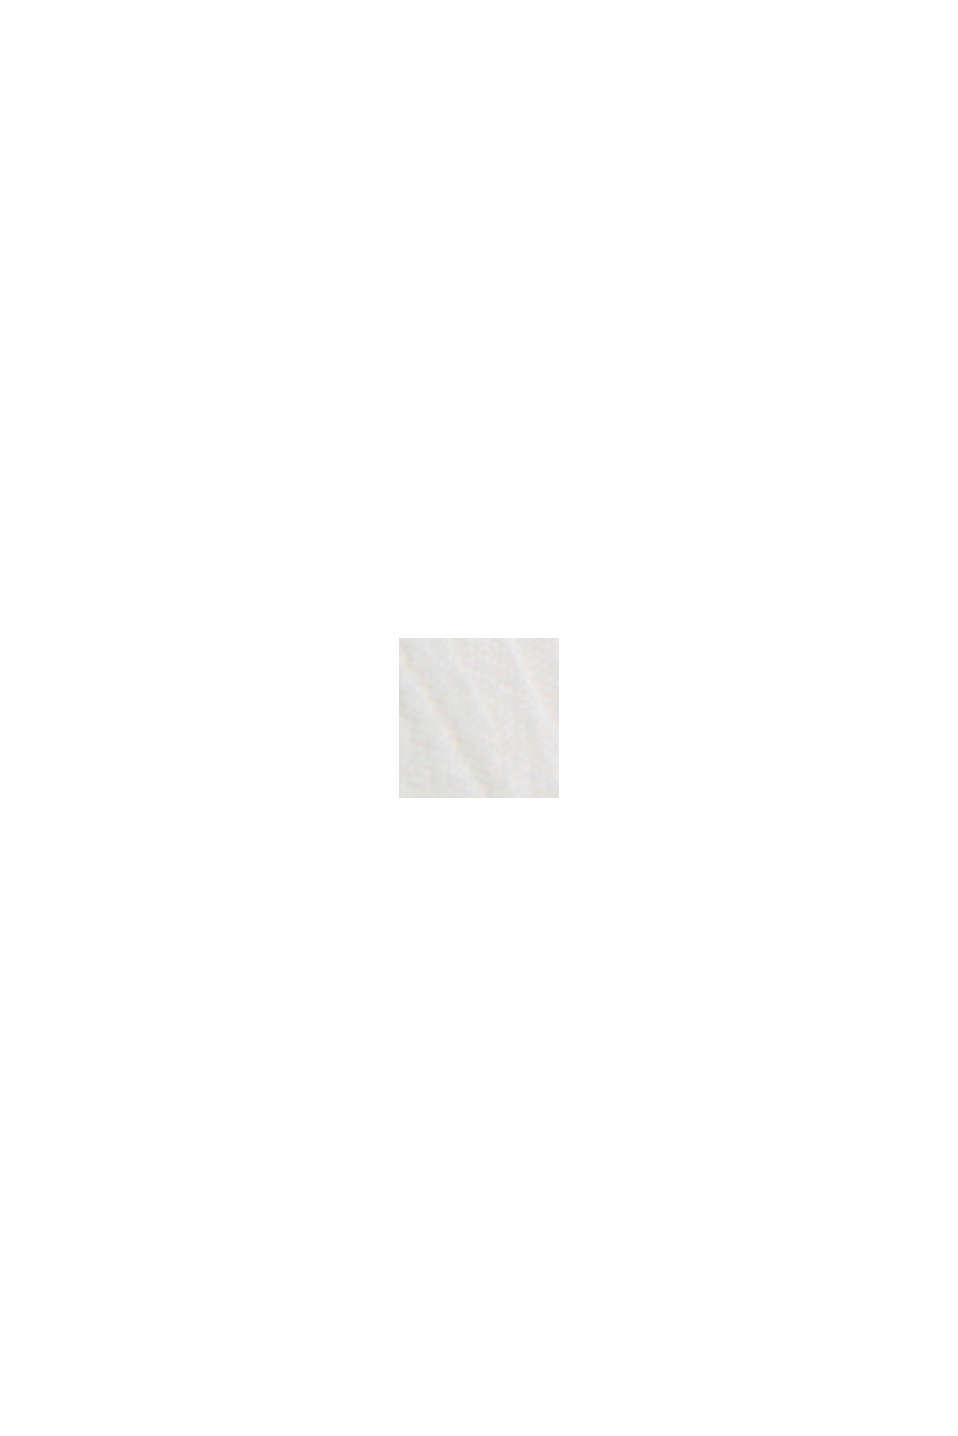 CURVY Crinkle-Bluse aus LENZING™ ECOVERO™, OFF WHITE, swatch